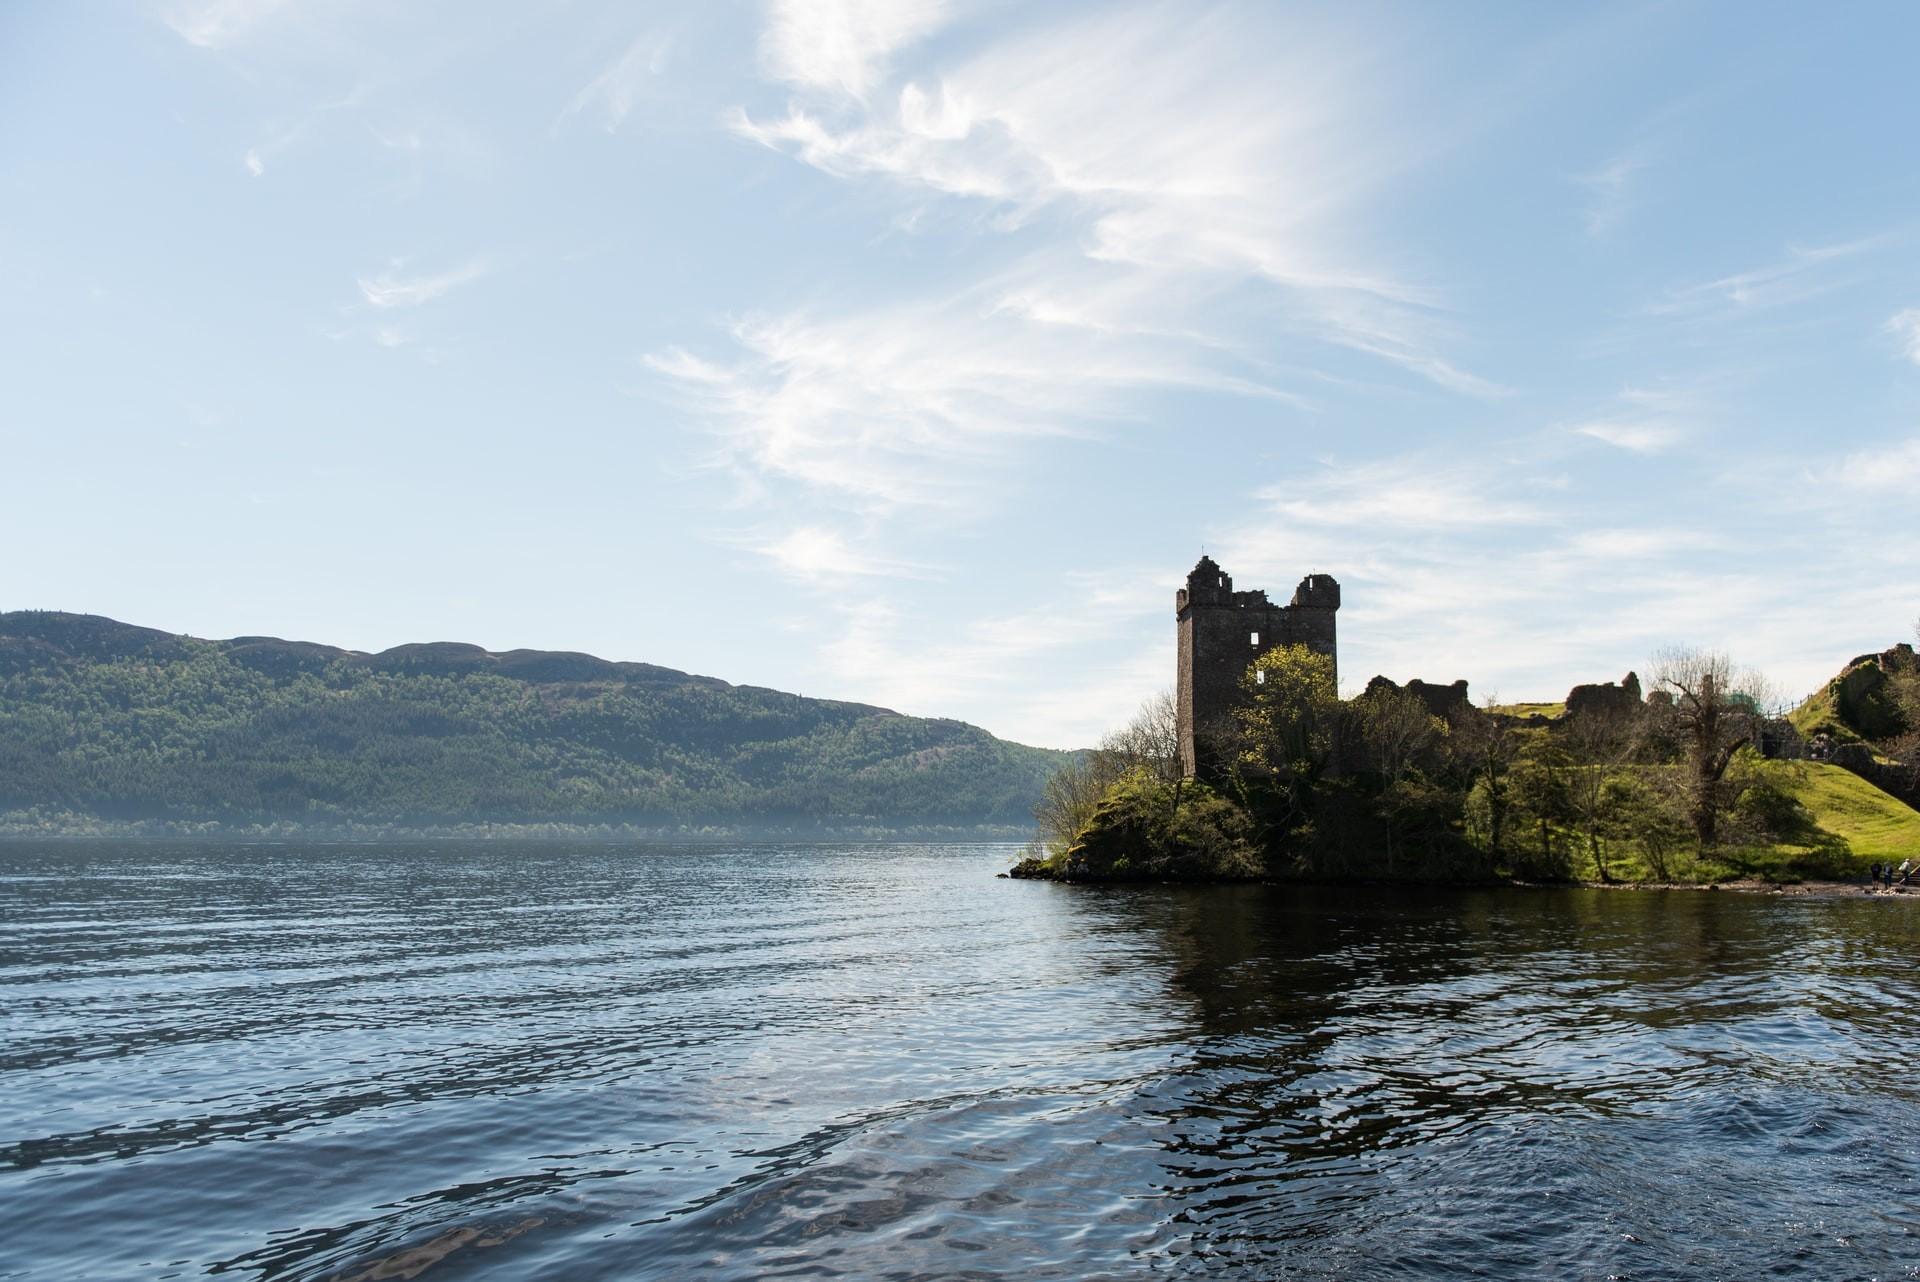 Urquhart Castle Loch Ness Scotland UK United Kingdom